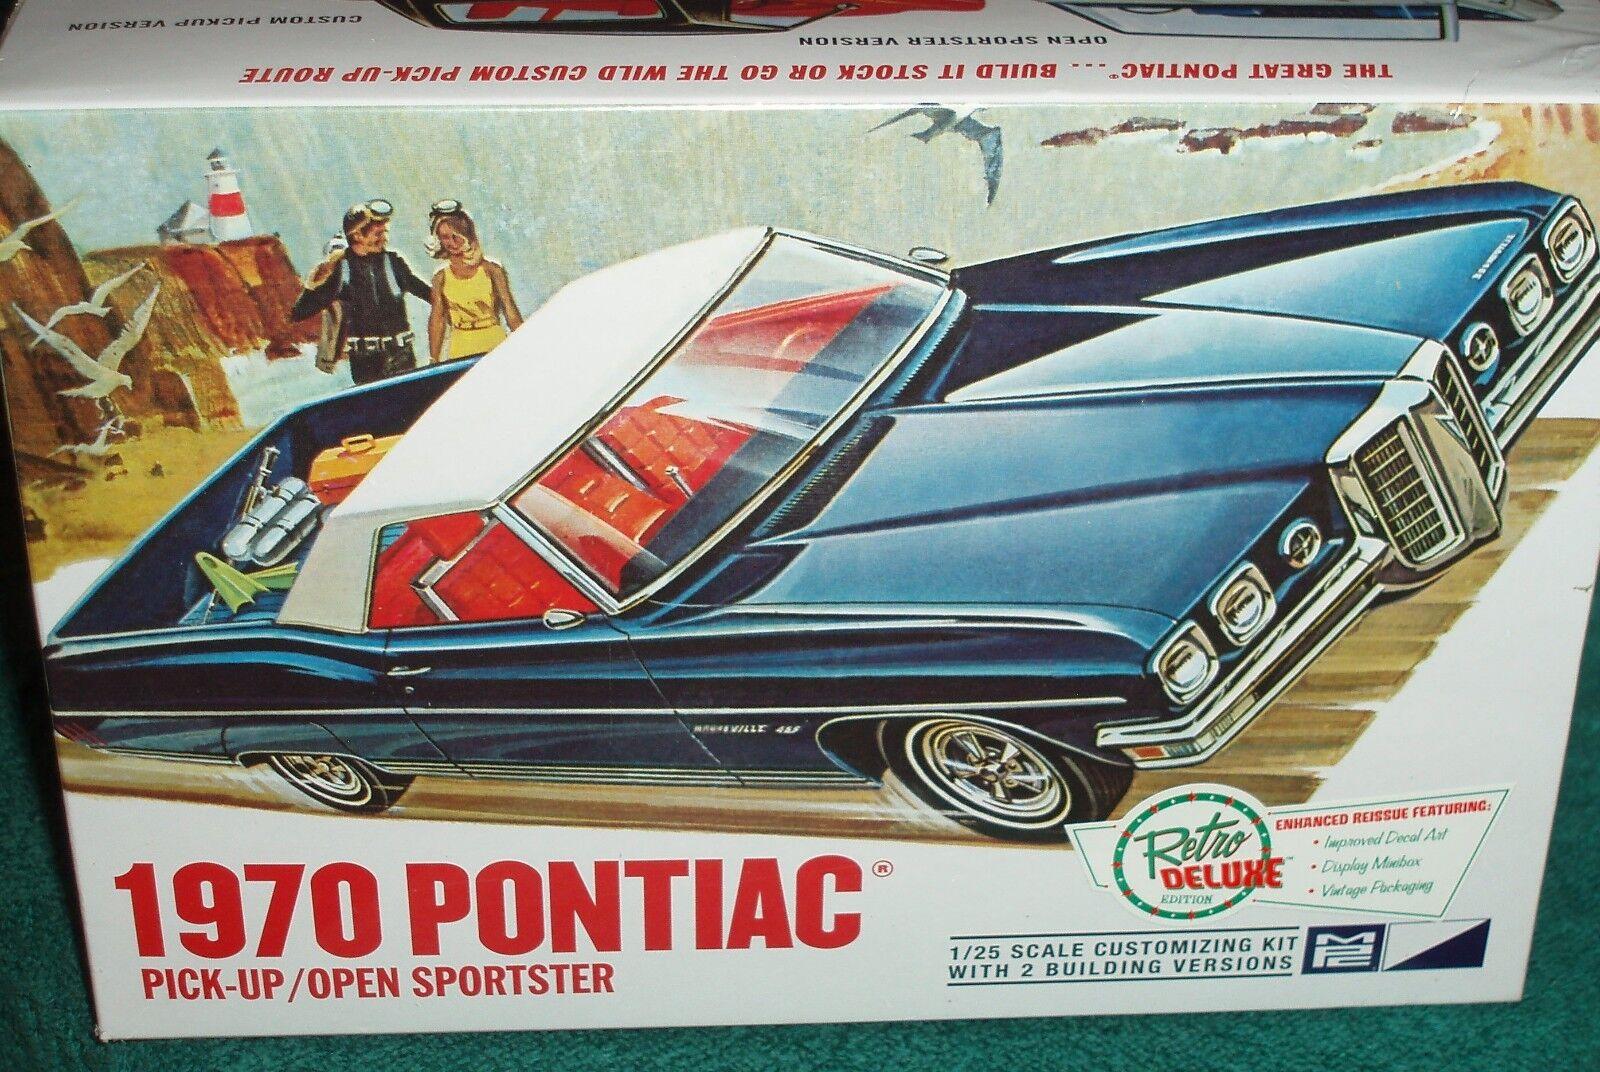 envío gratuito a nivel mundial MPC 1970 Pontiac Pontiac Pontiac recogida o abrir Sportster 1 25 Kit plástico modelo  primera reputación de los clientes primero